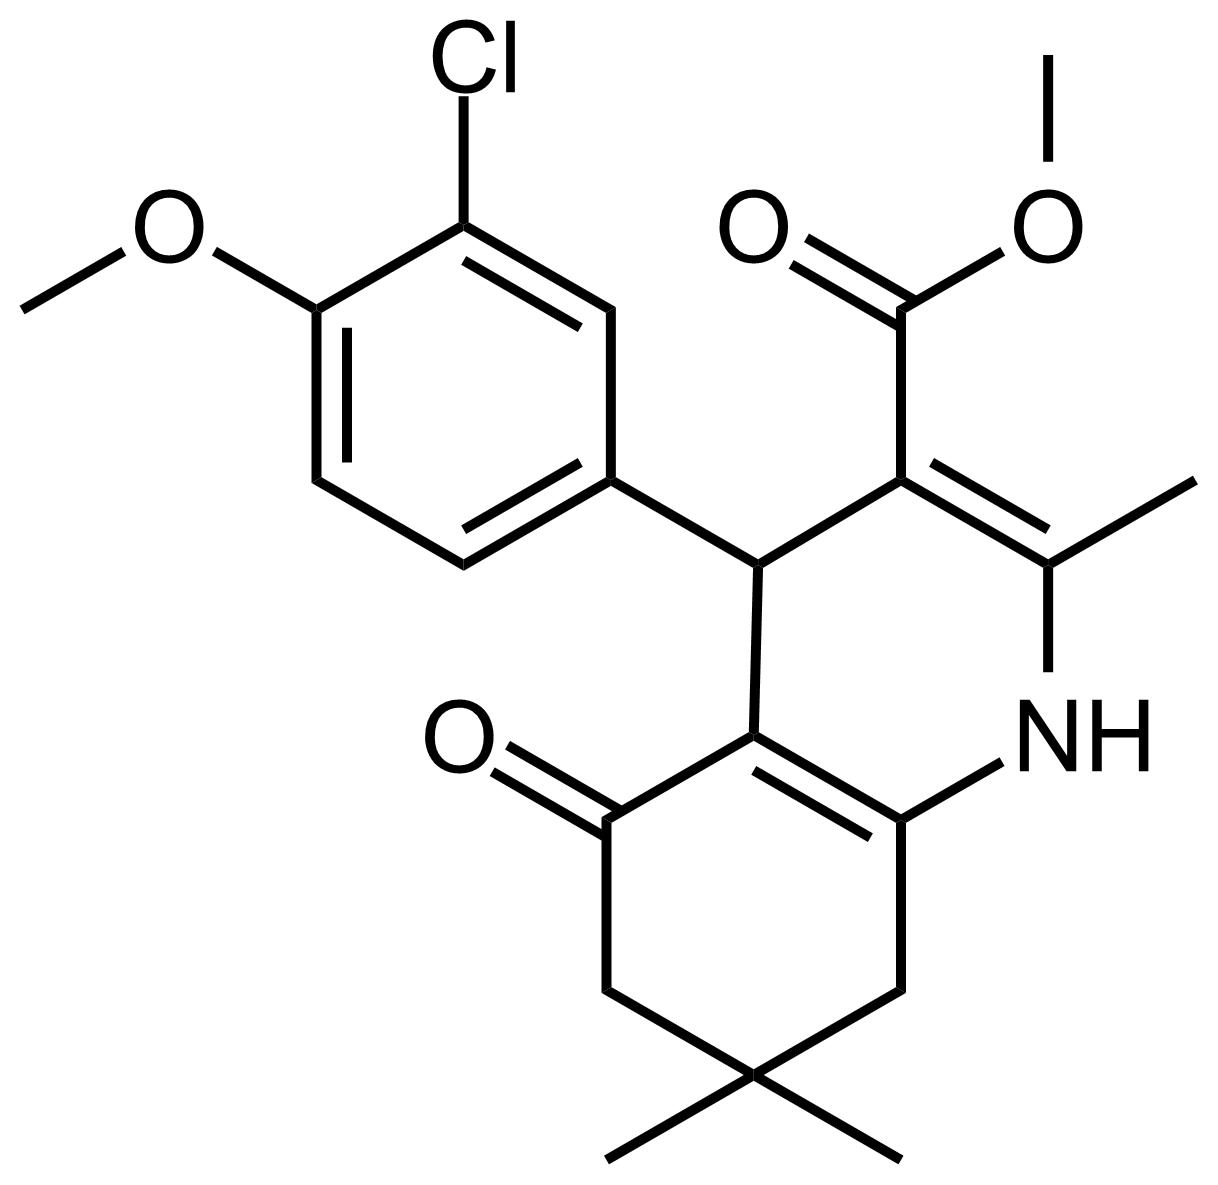 Structure of Methyl 4-(3-chloro-4-methoxyphenyl)-2,7,7-trimethyl-5-oxo-1,4,5,6,7,8-hexahydroquinoline-3-carboxylate